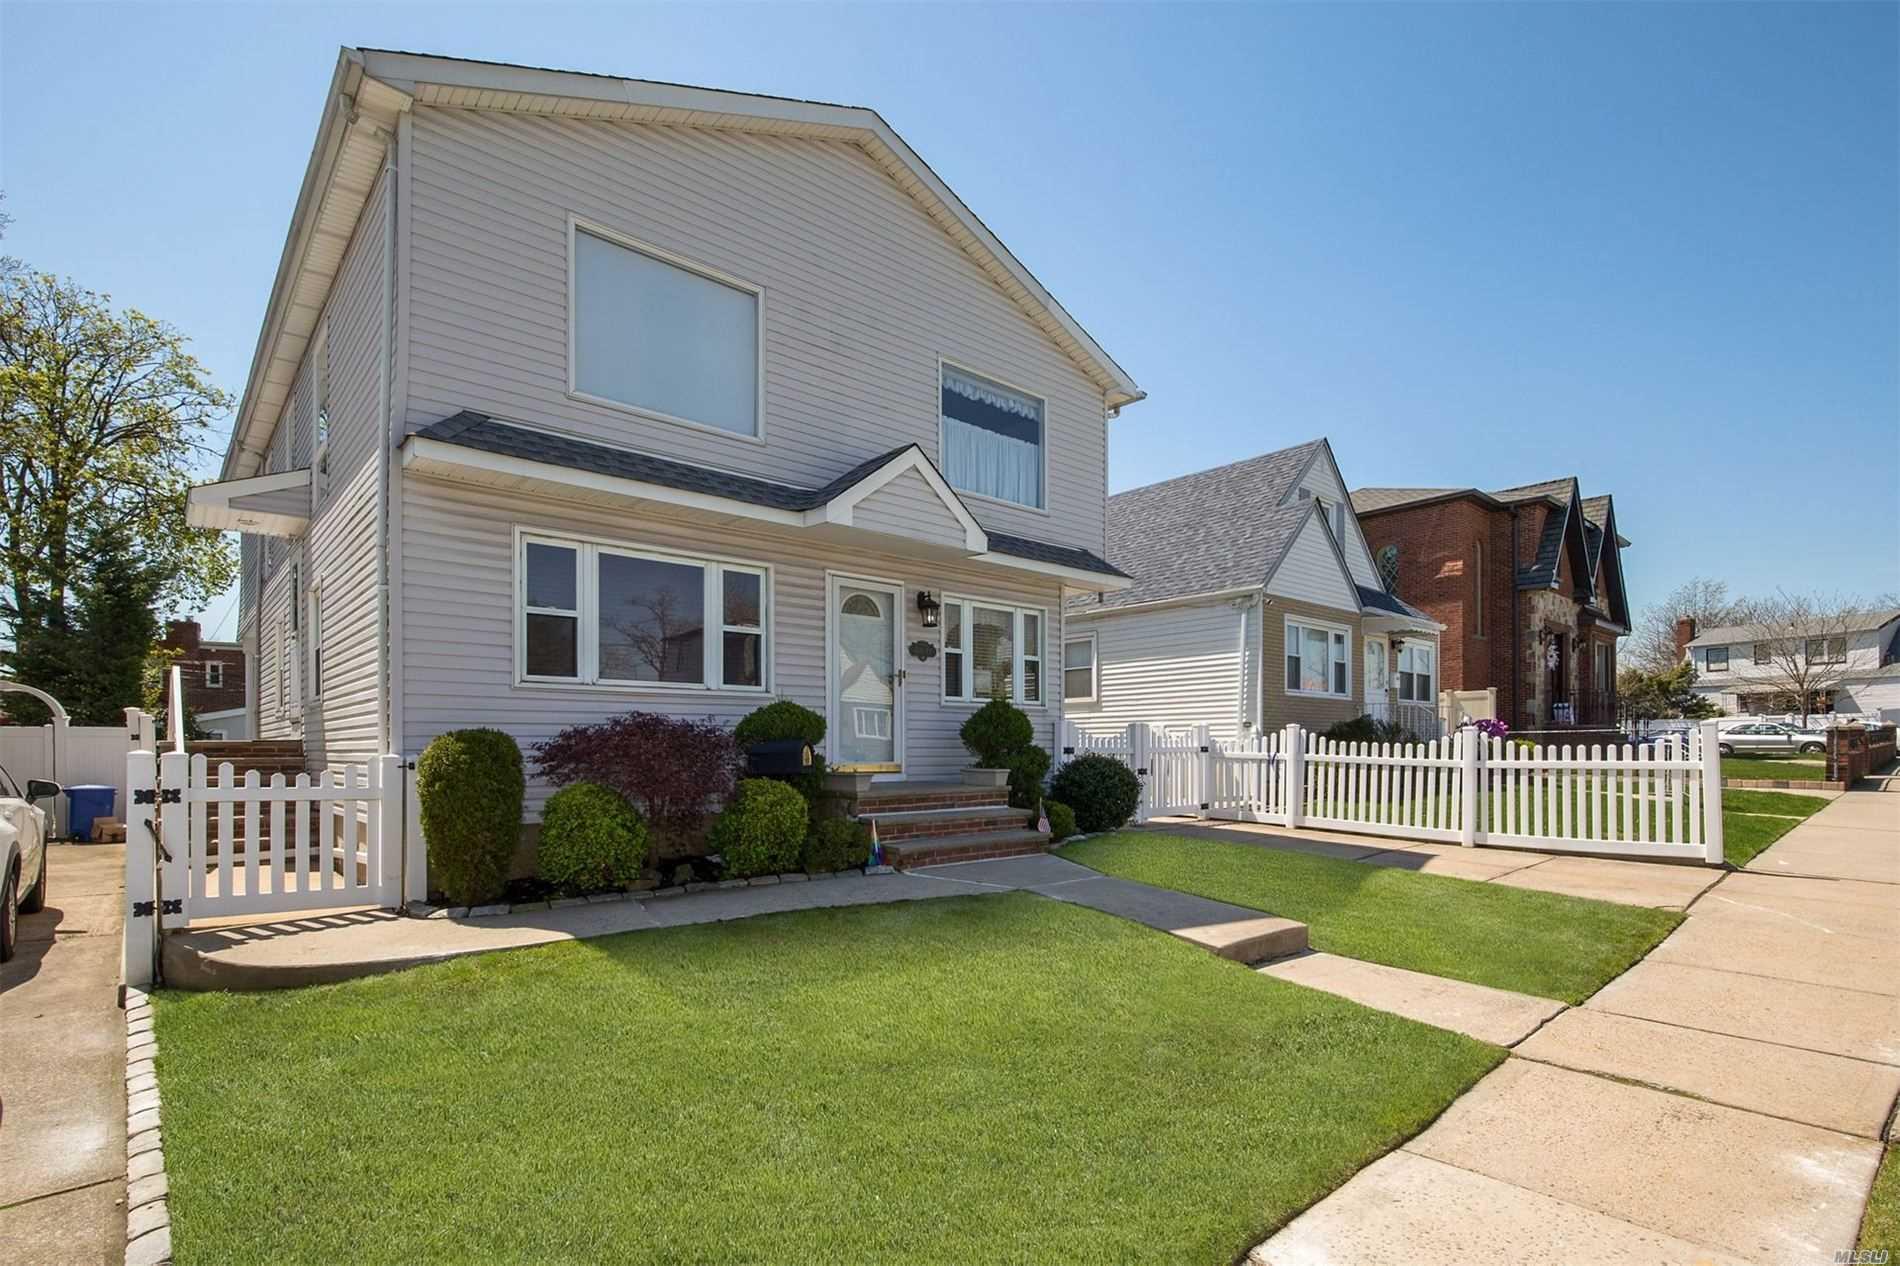 169-12 21 Rd - Whitestone, New York